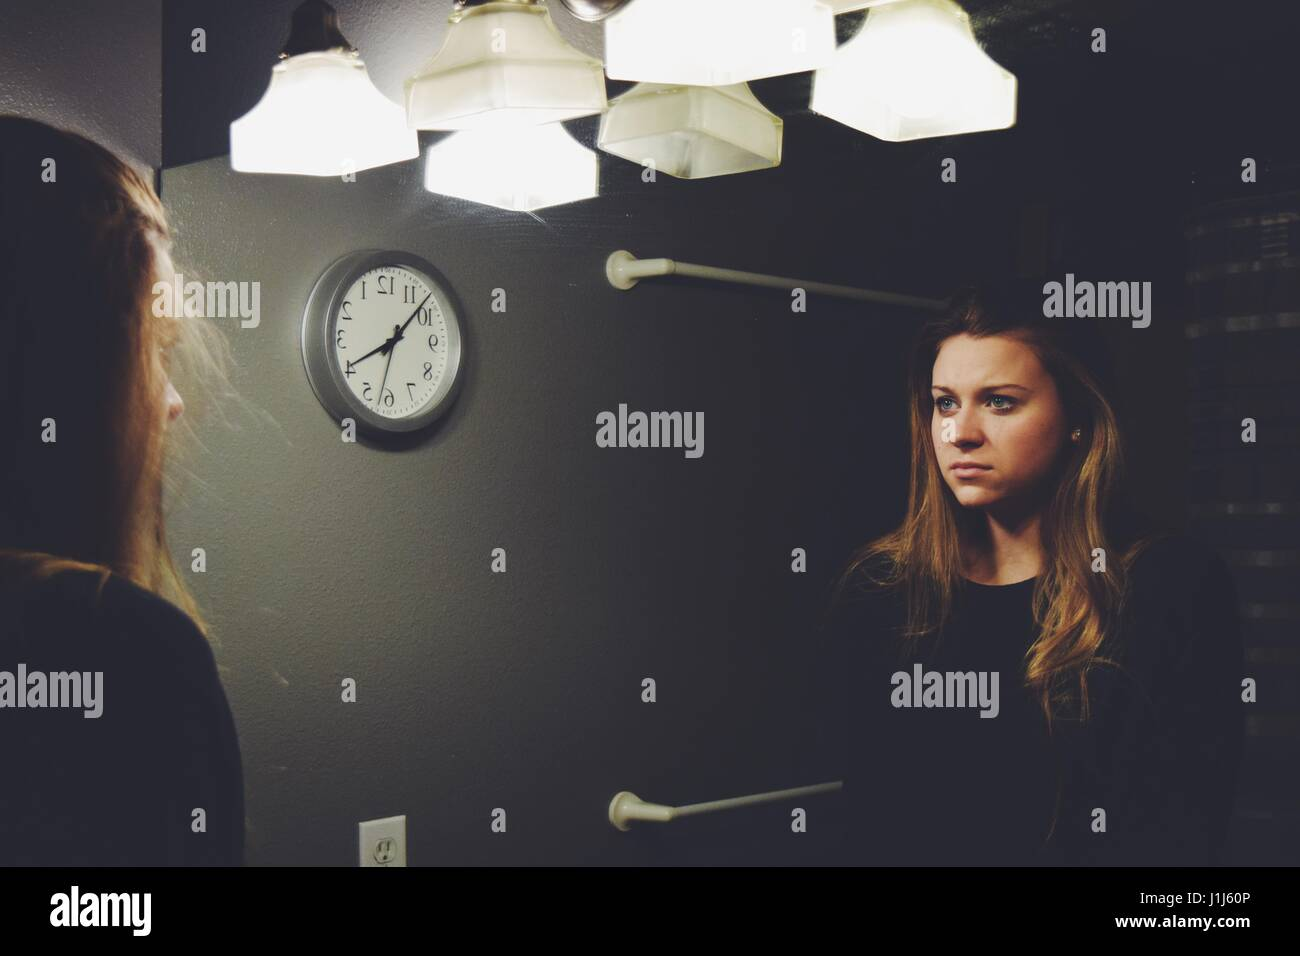 Mirror Reflection - Stock Image